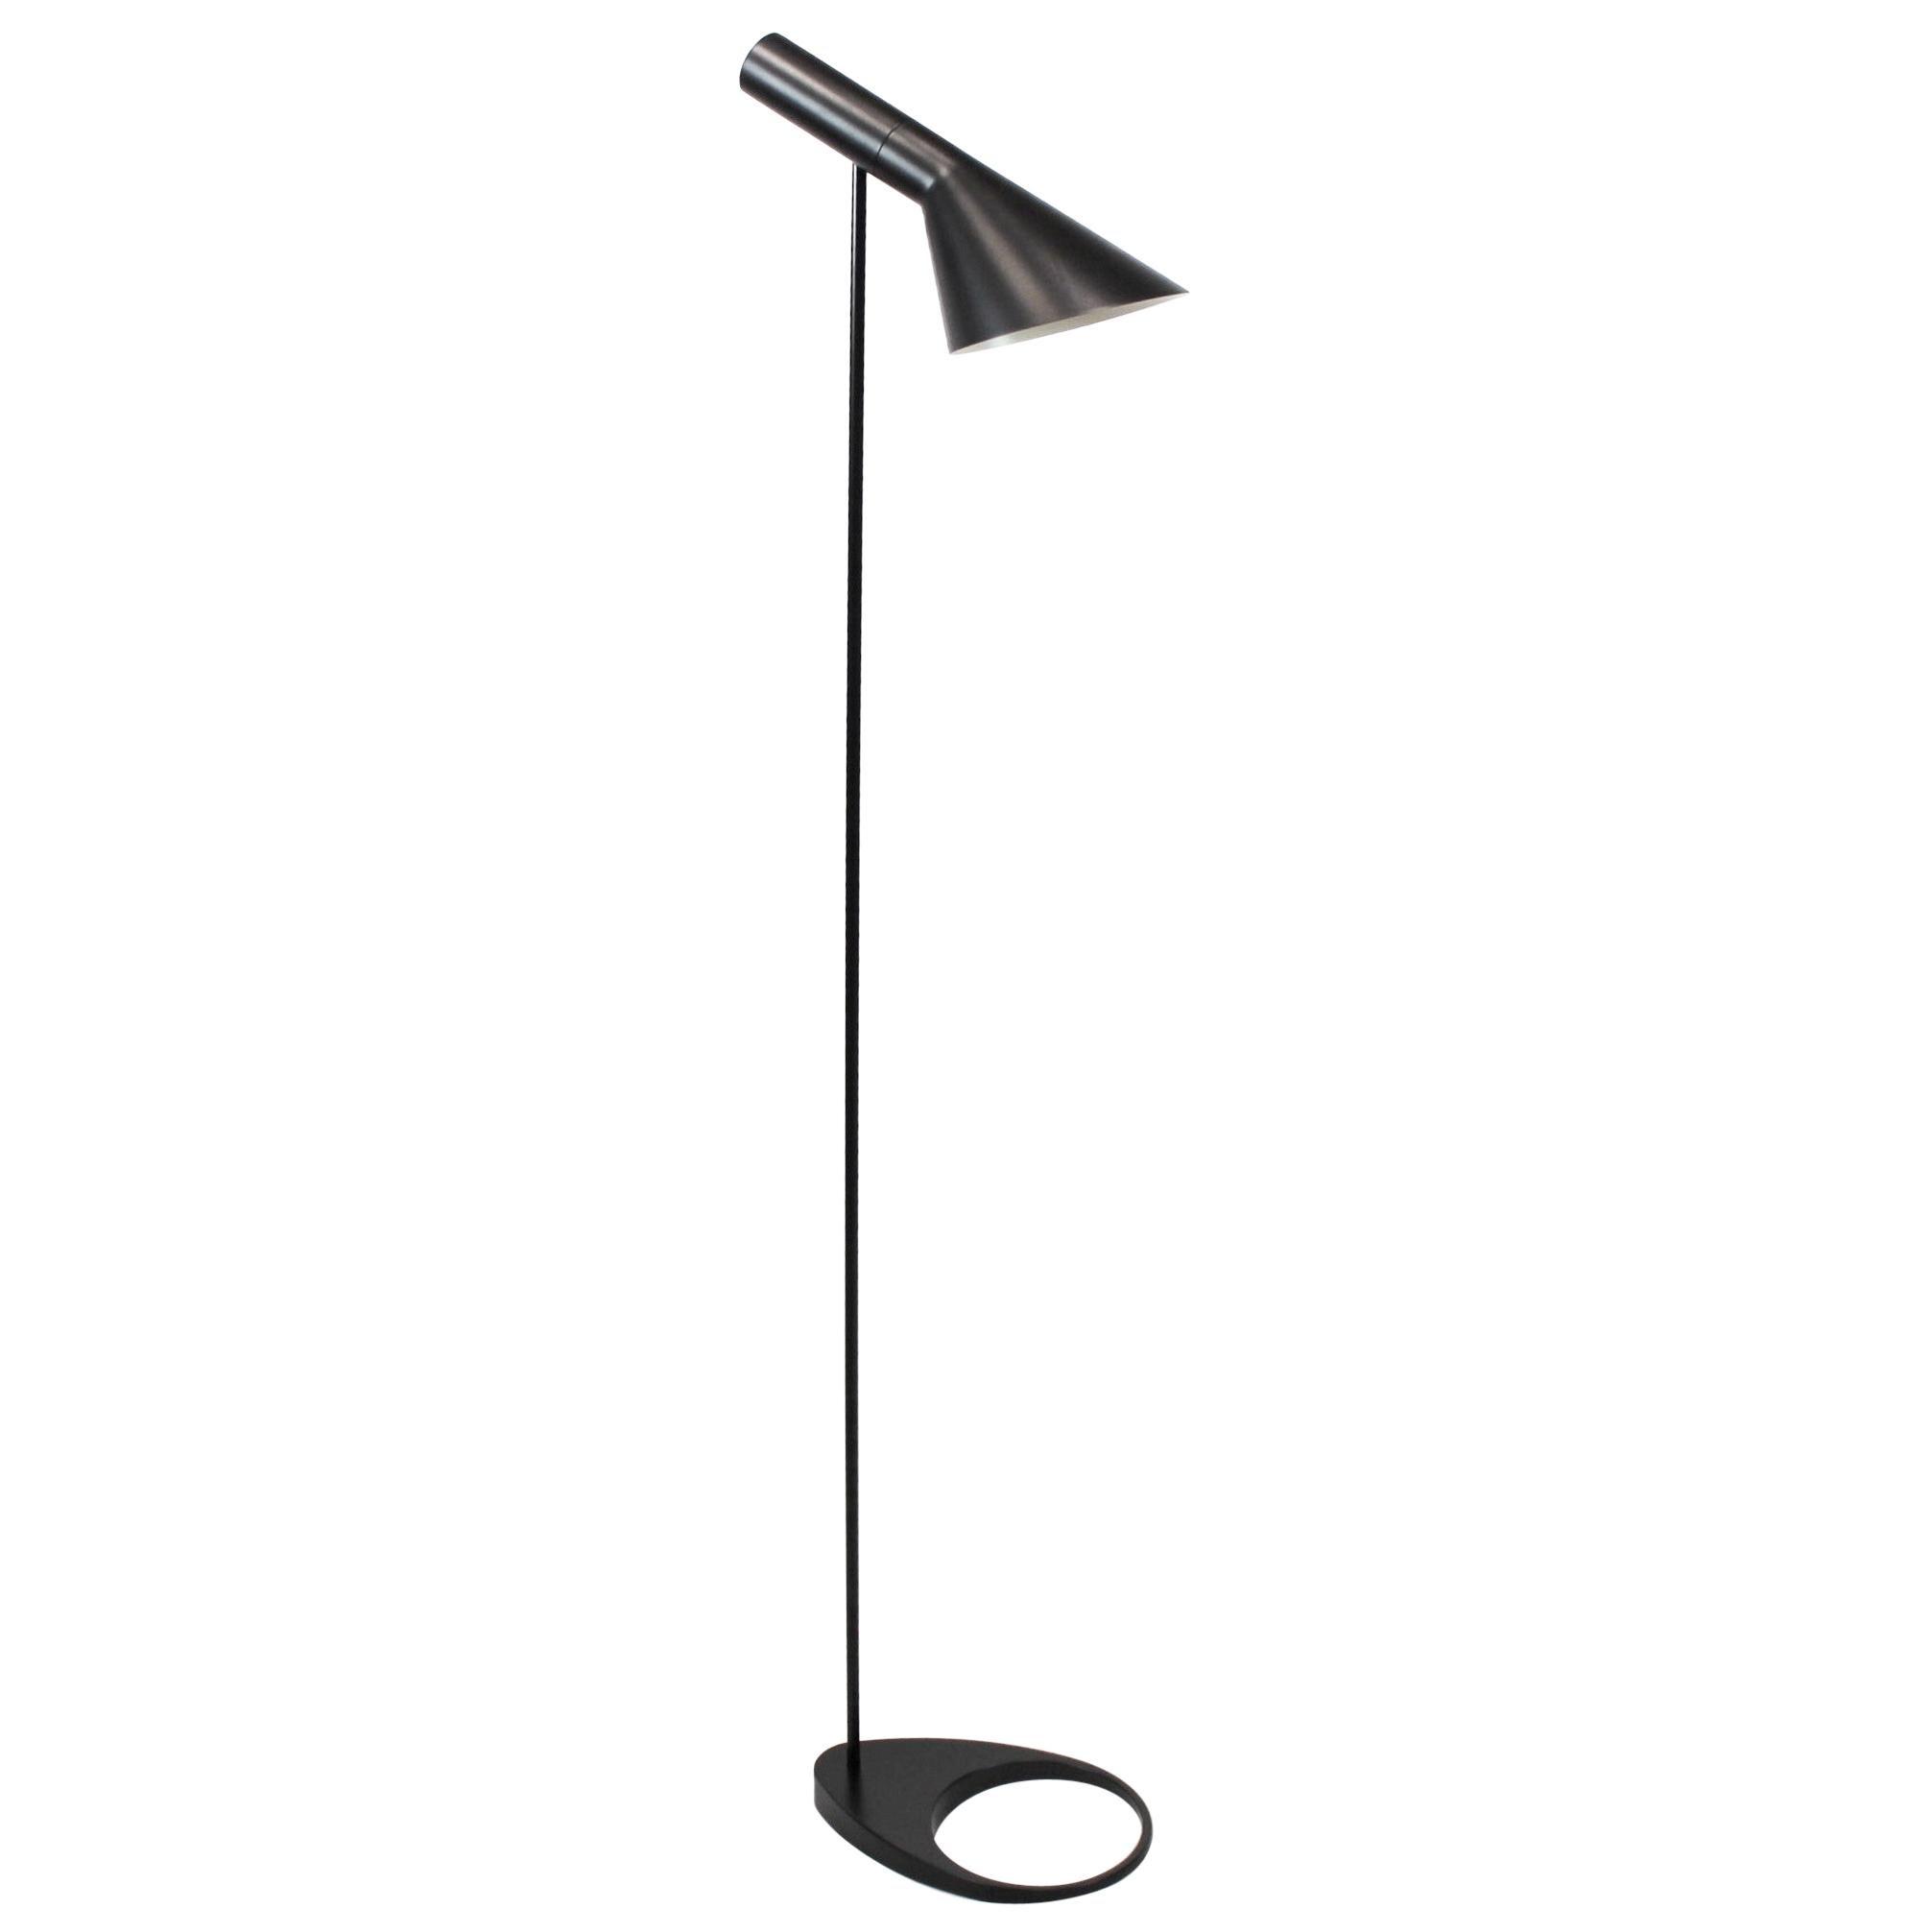 Black Floor Lamp by Arne Jacobsen and Louis Poulsen